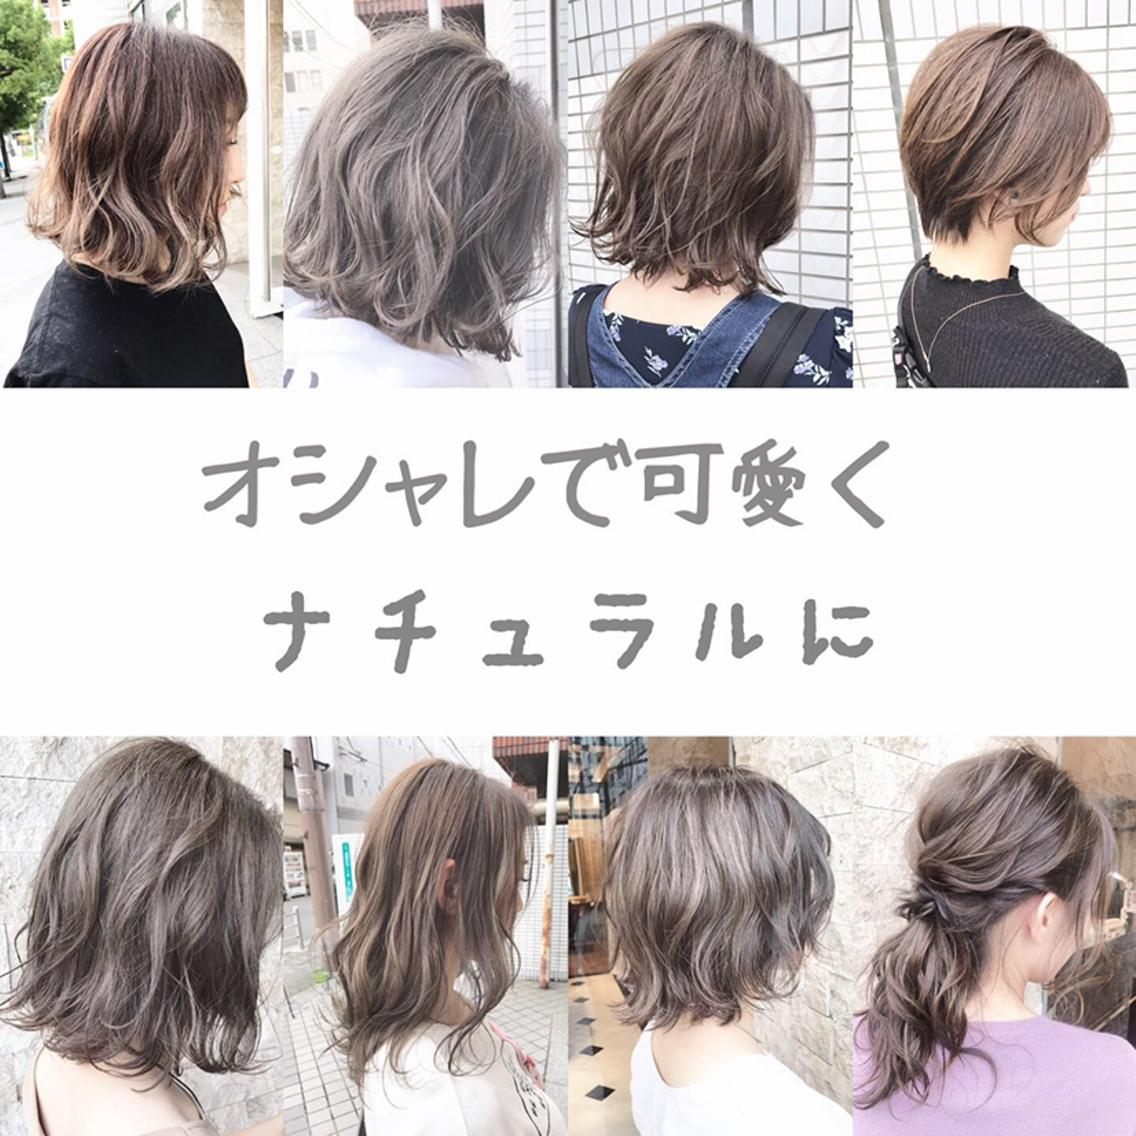 uno pulir所属・トップスタイリスト 永尾拓也の掲載